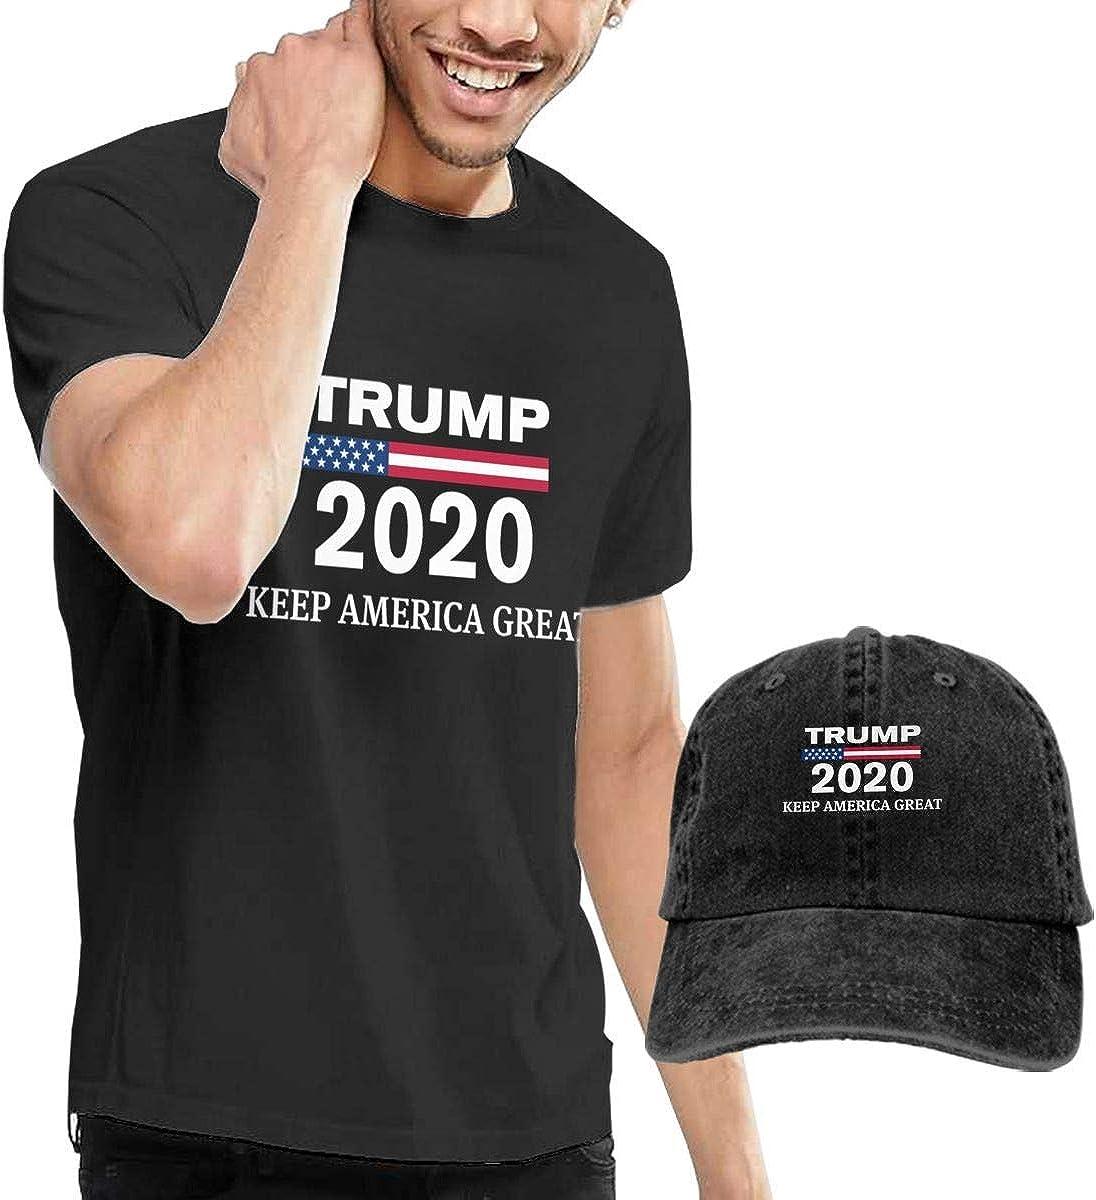 Henrnt Camiseta para Hombre, Trump 2020 Keep America Great 1 Tshirt Short Sleeve Denim Hat